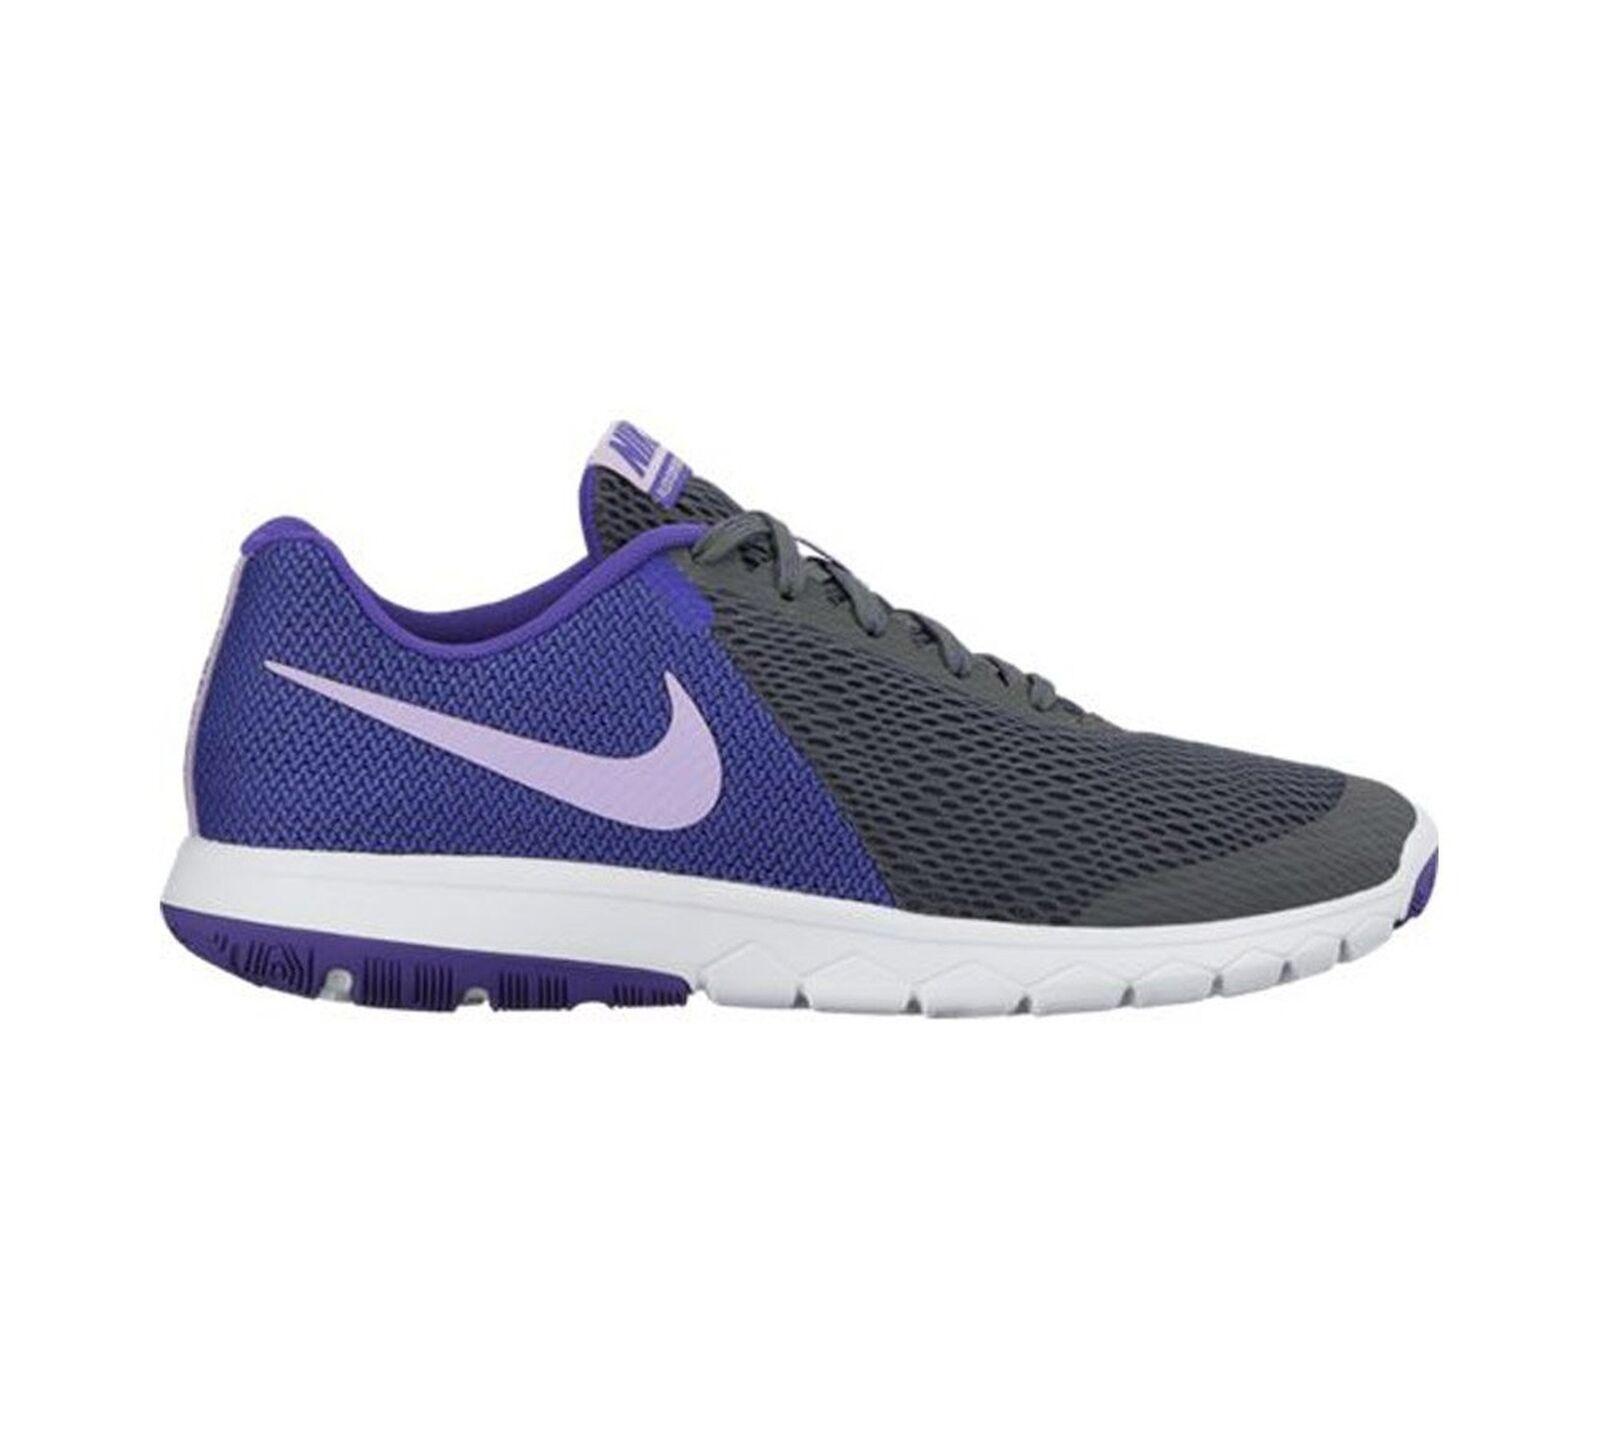 Nike Womens Flex Experience RN 5 Running shoes (8 B(M) US, Dark Grey Urban Lil...